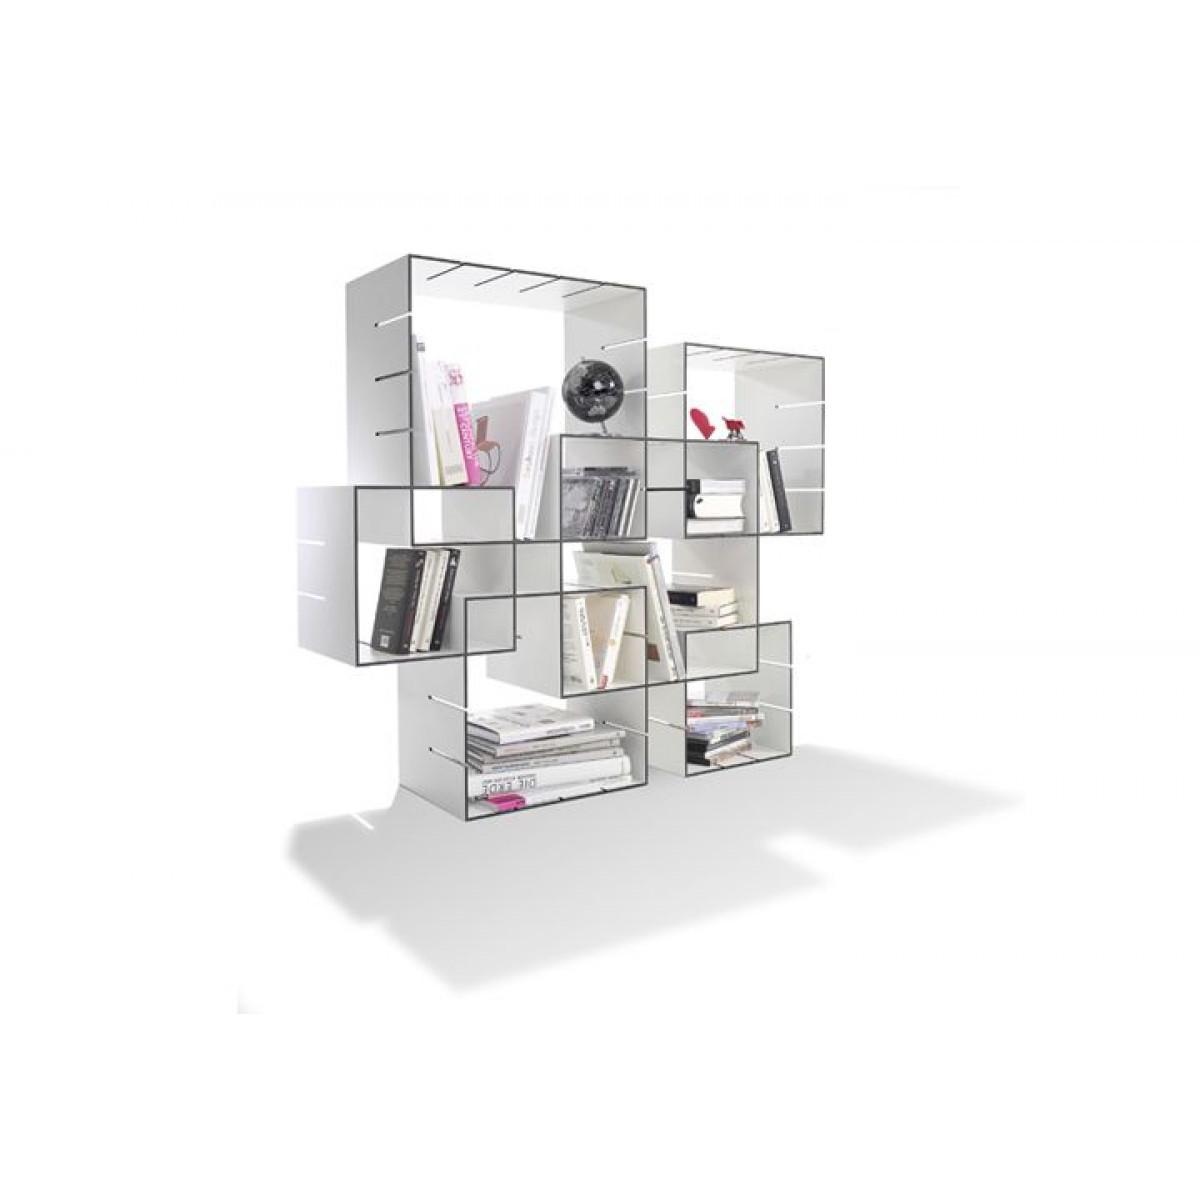 Set of 3 Cubes Stand shelf / Hanging Shelf Konnex